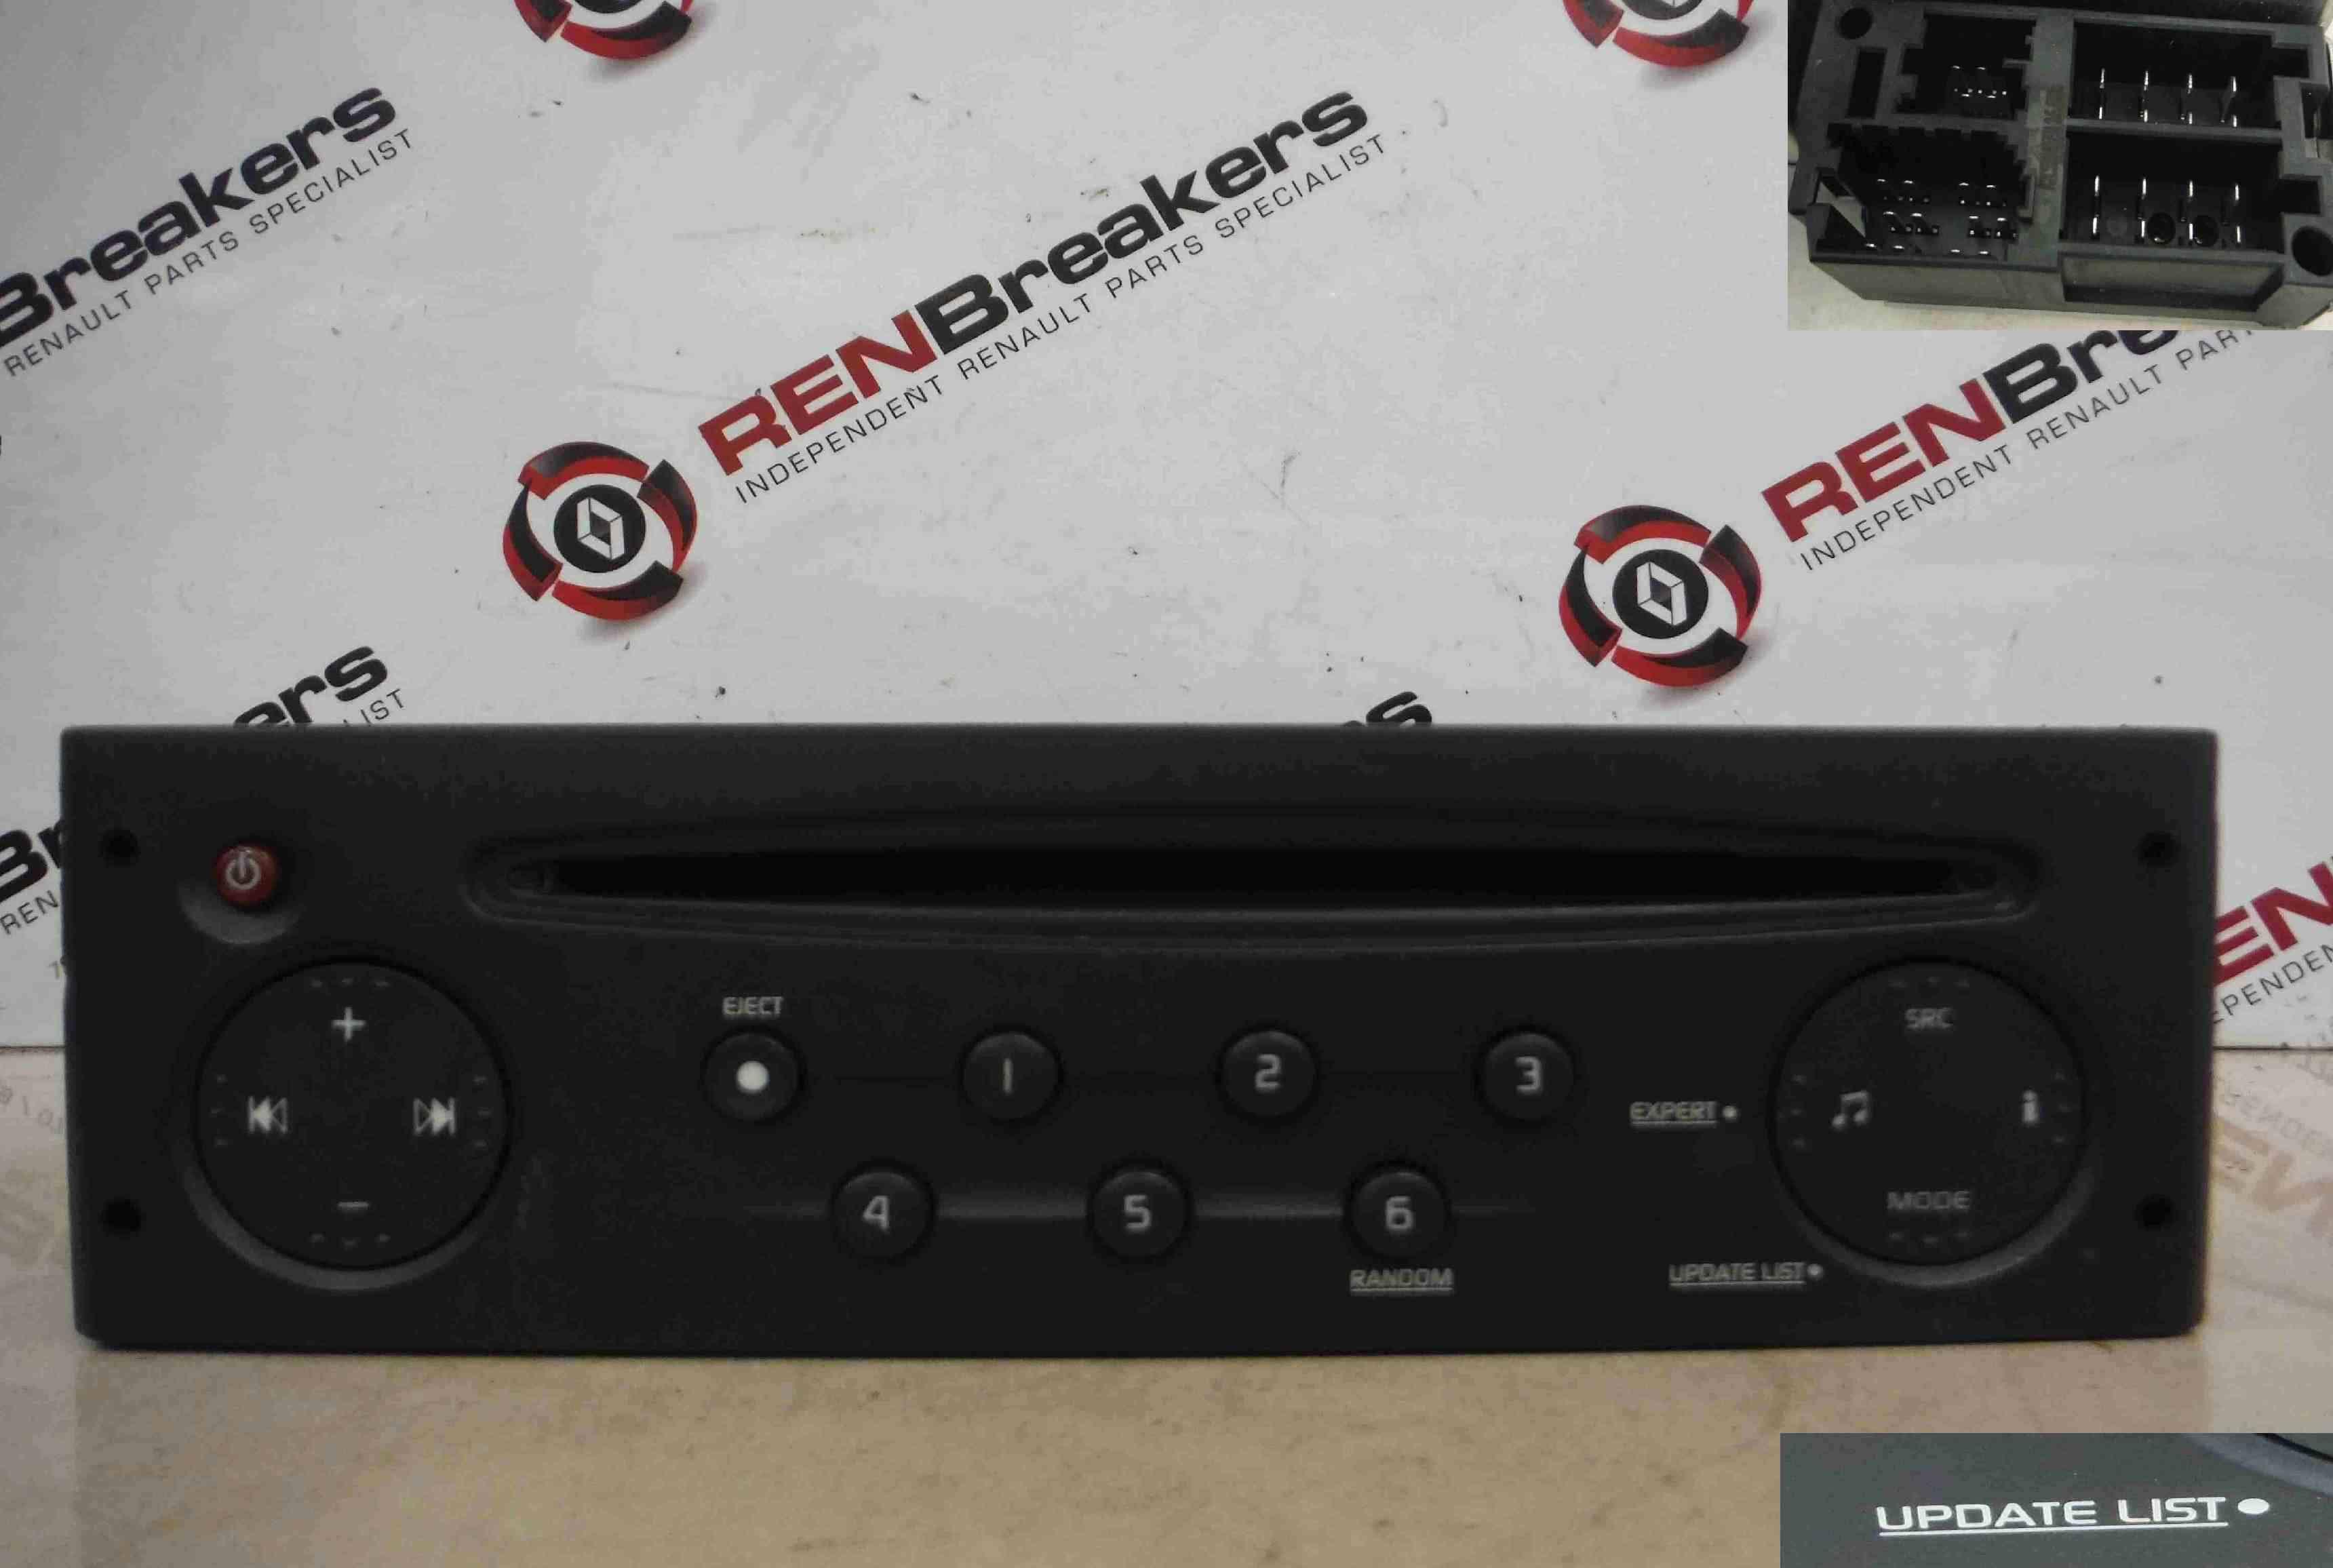 Renault Clio MK2 2001-2006 Radio CD Player Update List  Code 8200633621